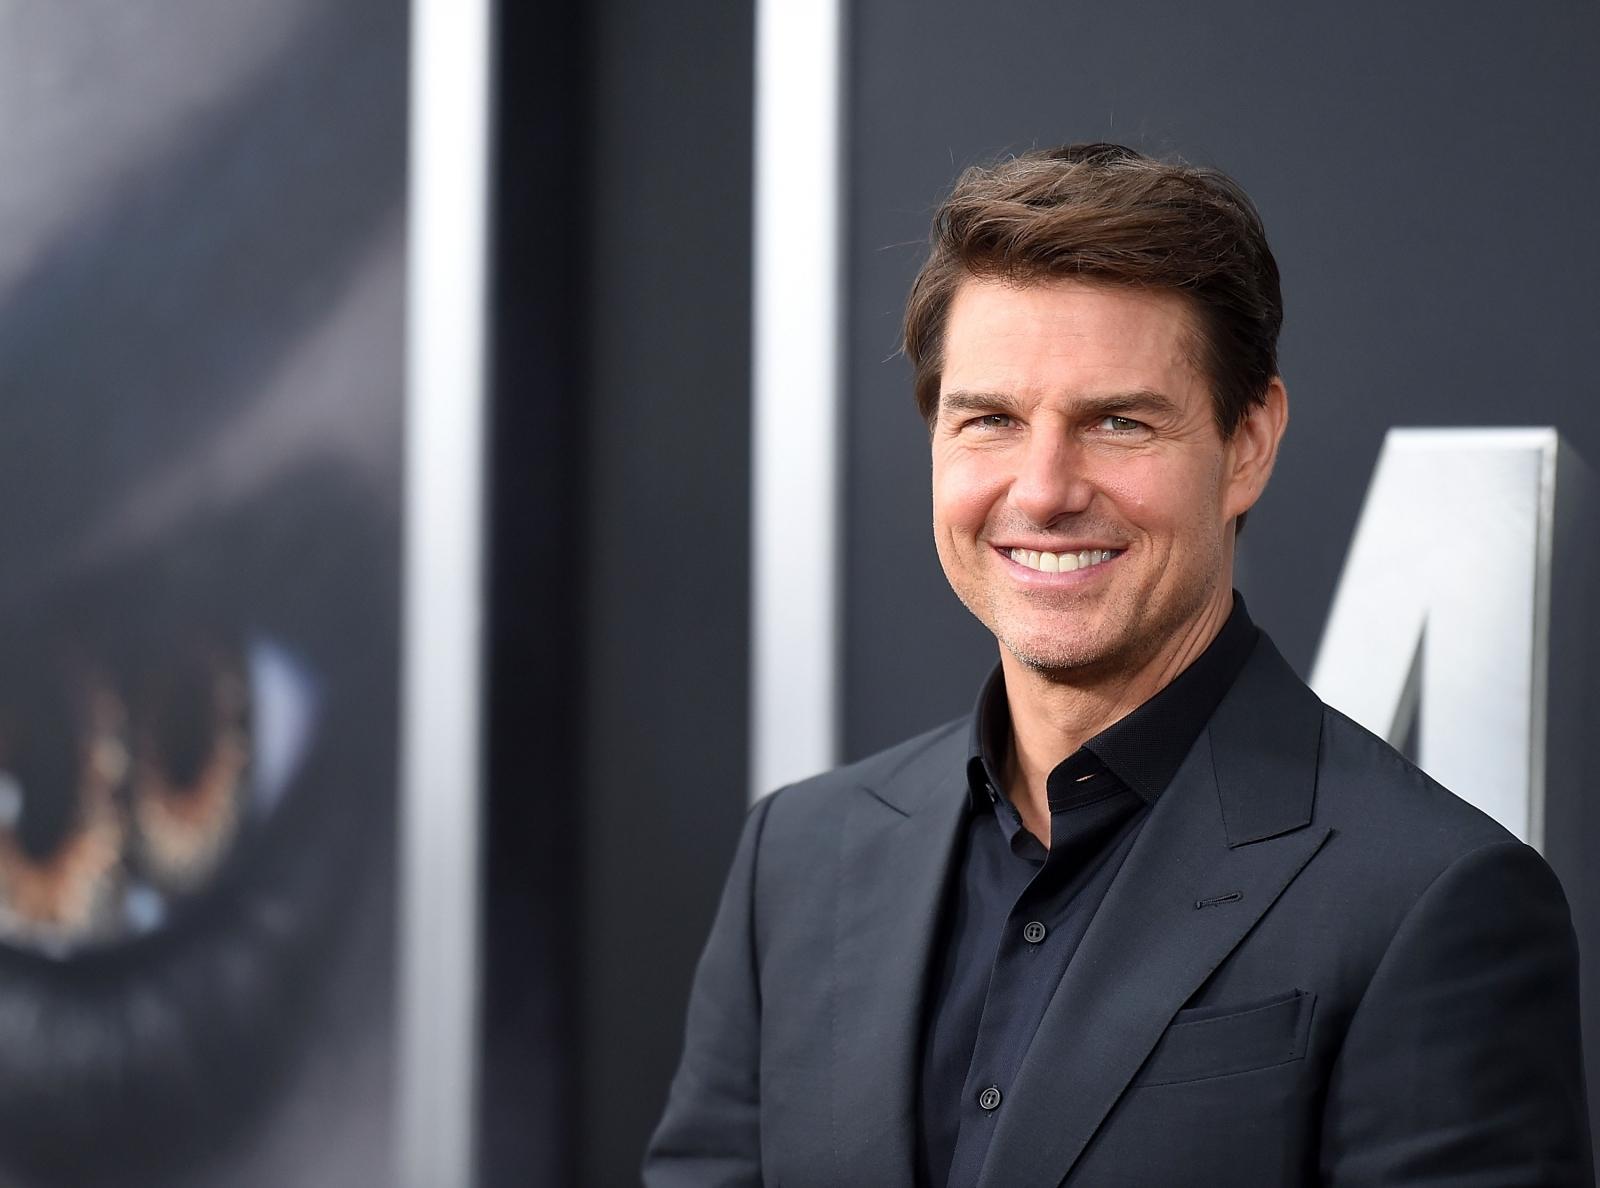 10 Tom Cruіѕе - American Actor and Producer